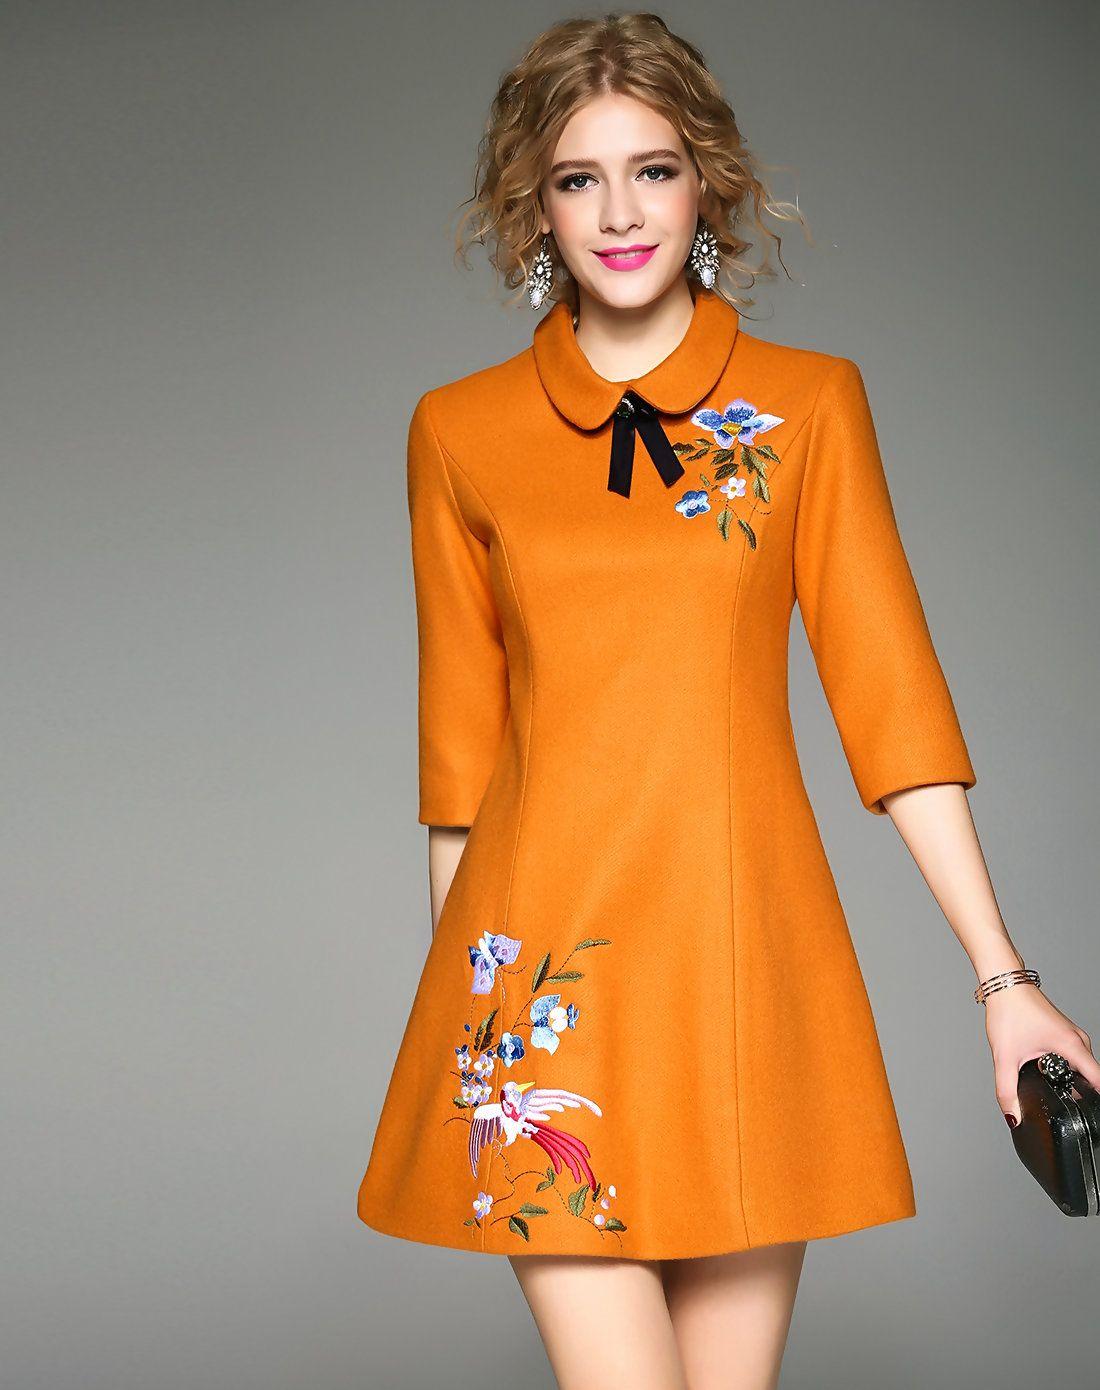 Adorewe Qeexi Dark Yellow Embroidery A Line Half Sleeve Woolen Dress Adorewe Com Vestidos Estilosos Moda Feminina Vestidos Legais